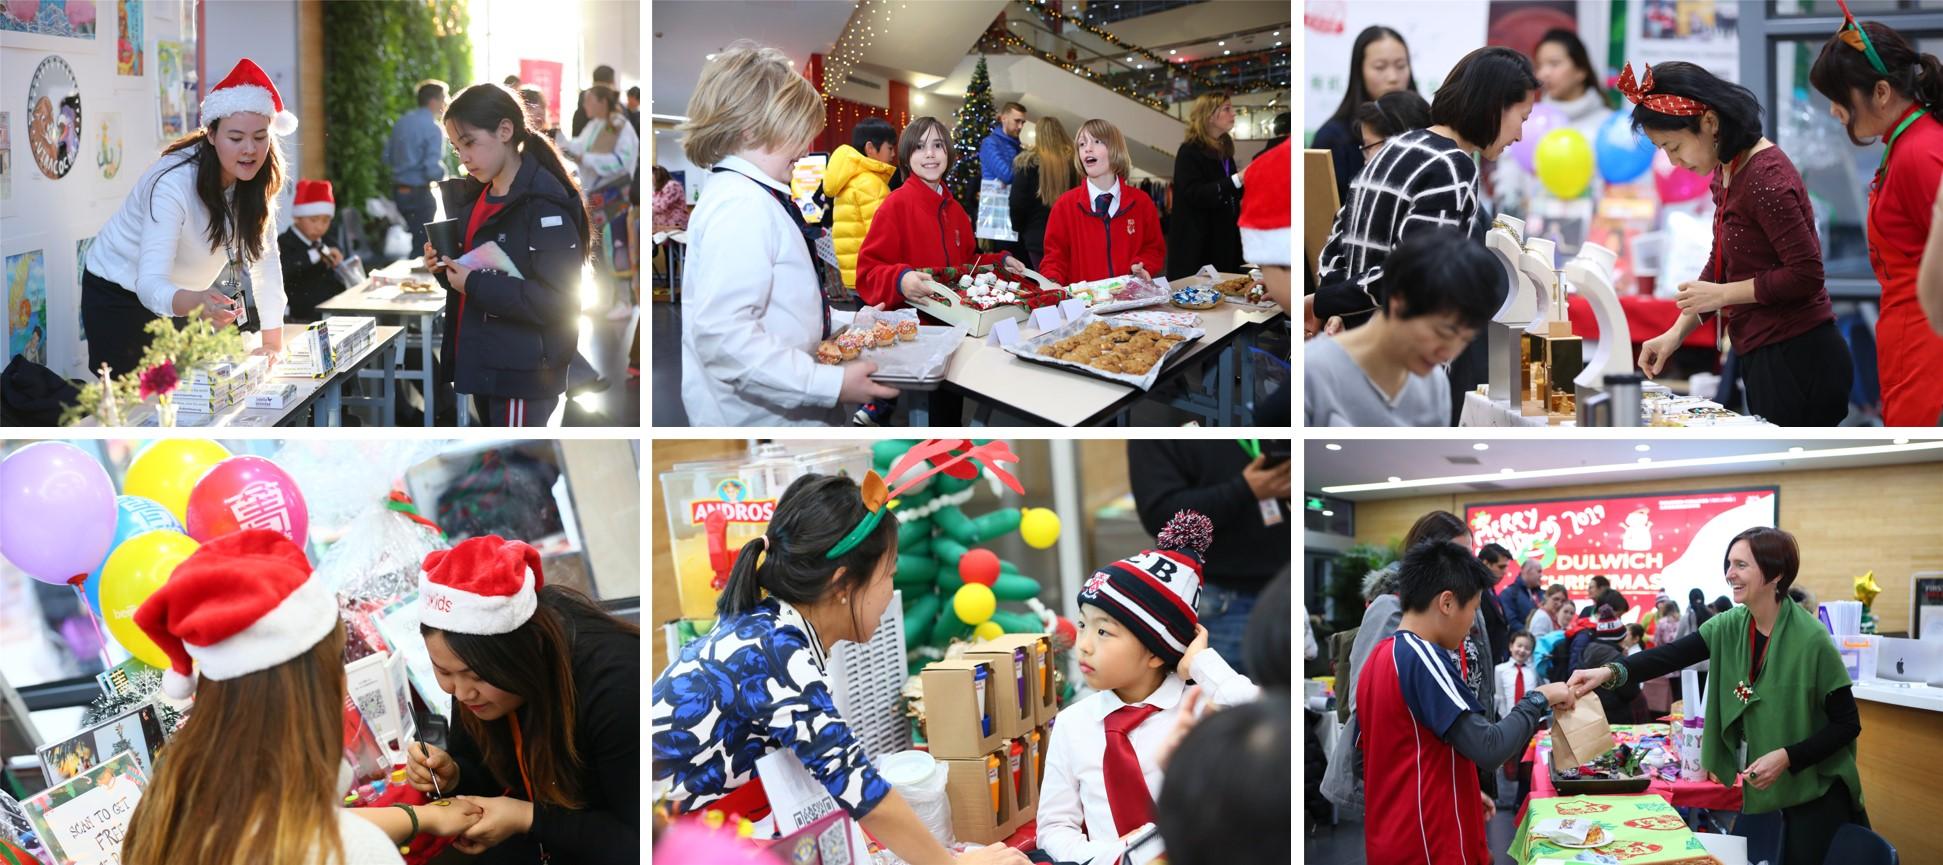 dulwich-christmas-bazzar-3-北京德威英国国际学校